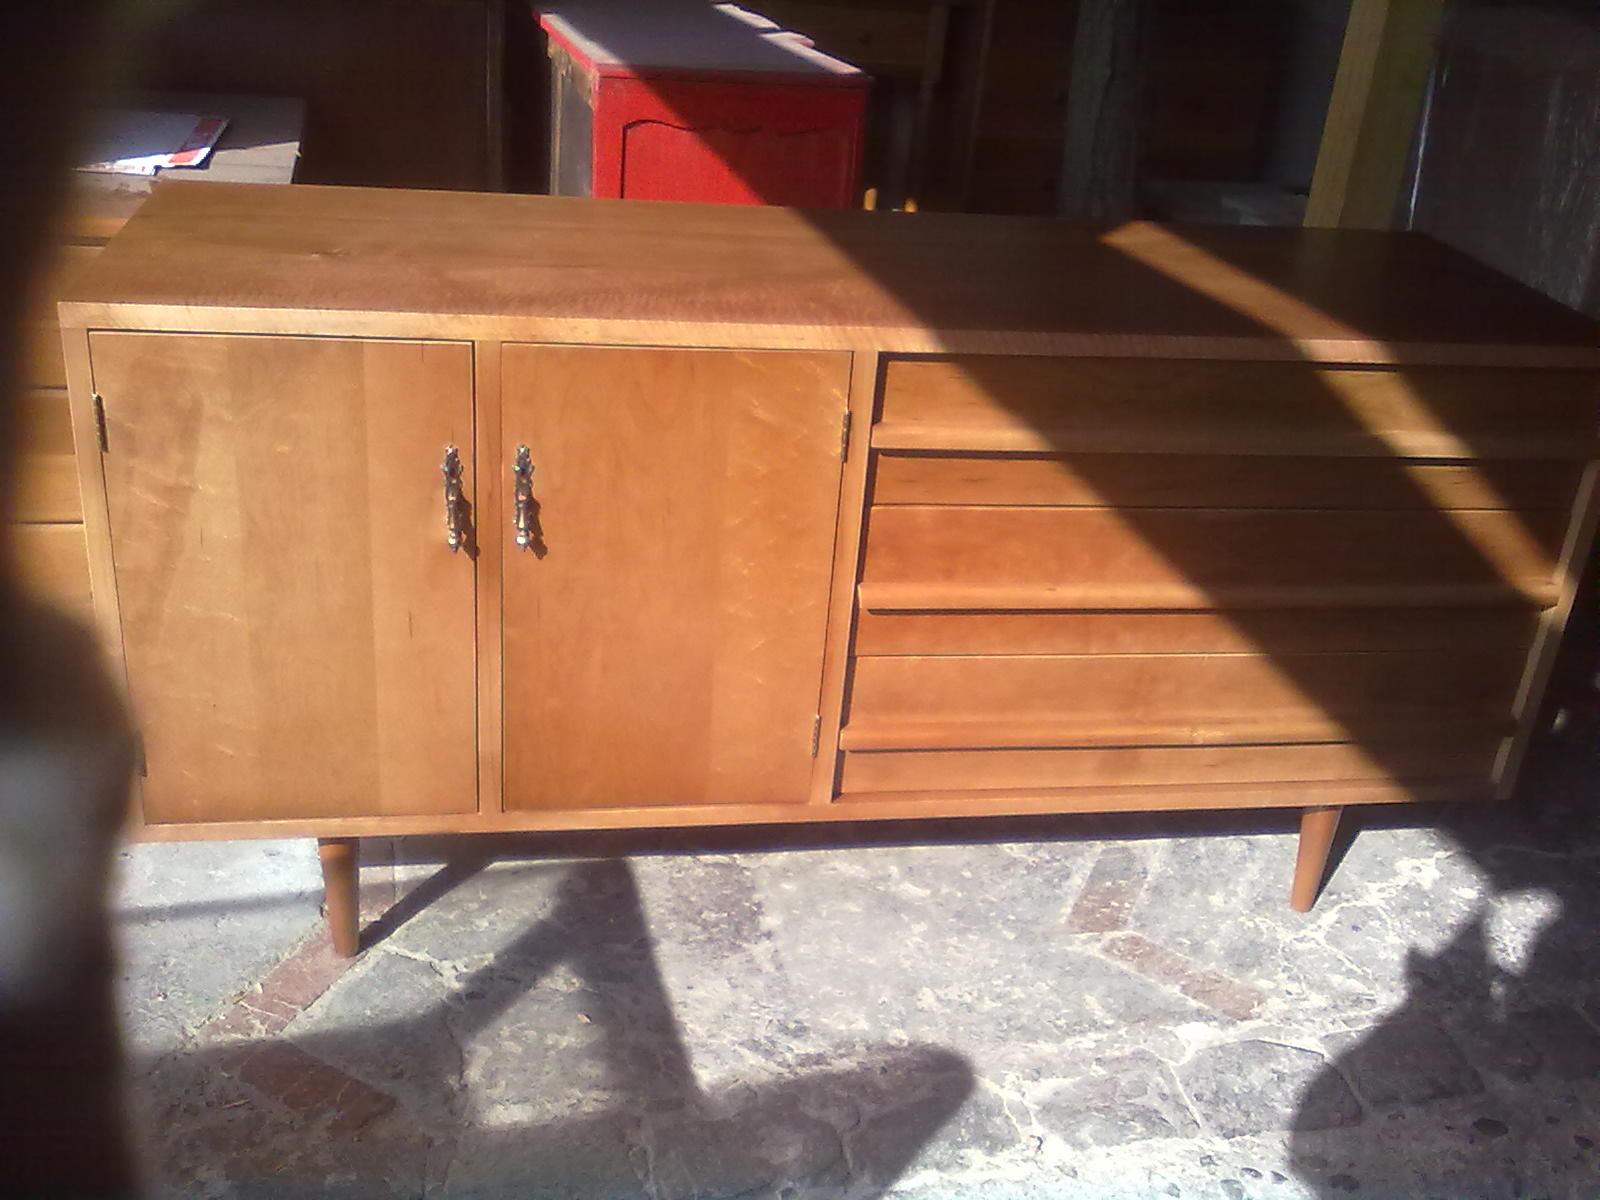 Muebles kotue mueble estilo antiguo - Muebles estilo antiguo ...